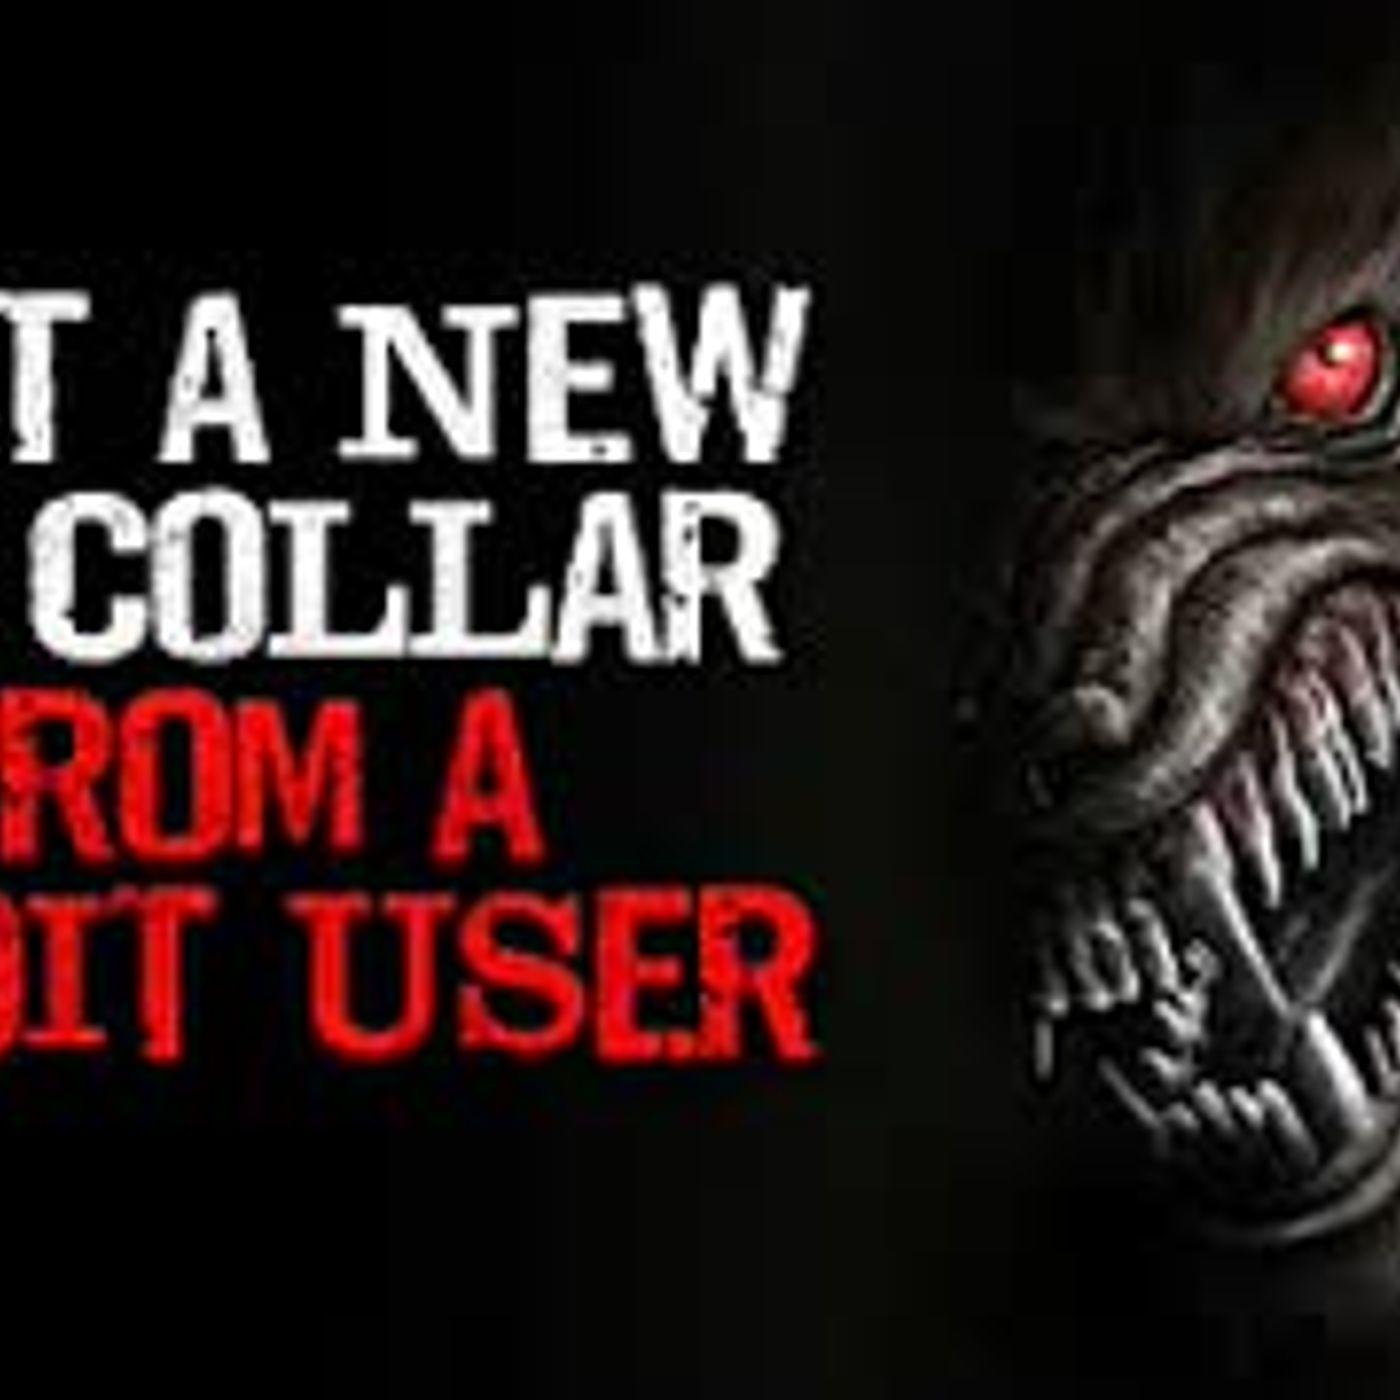 """I got a new dog collar from a reddit user"" Creepypasta"